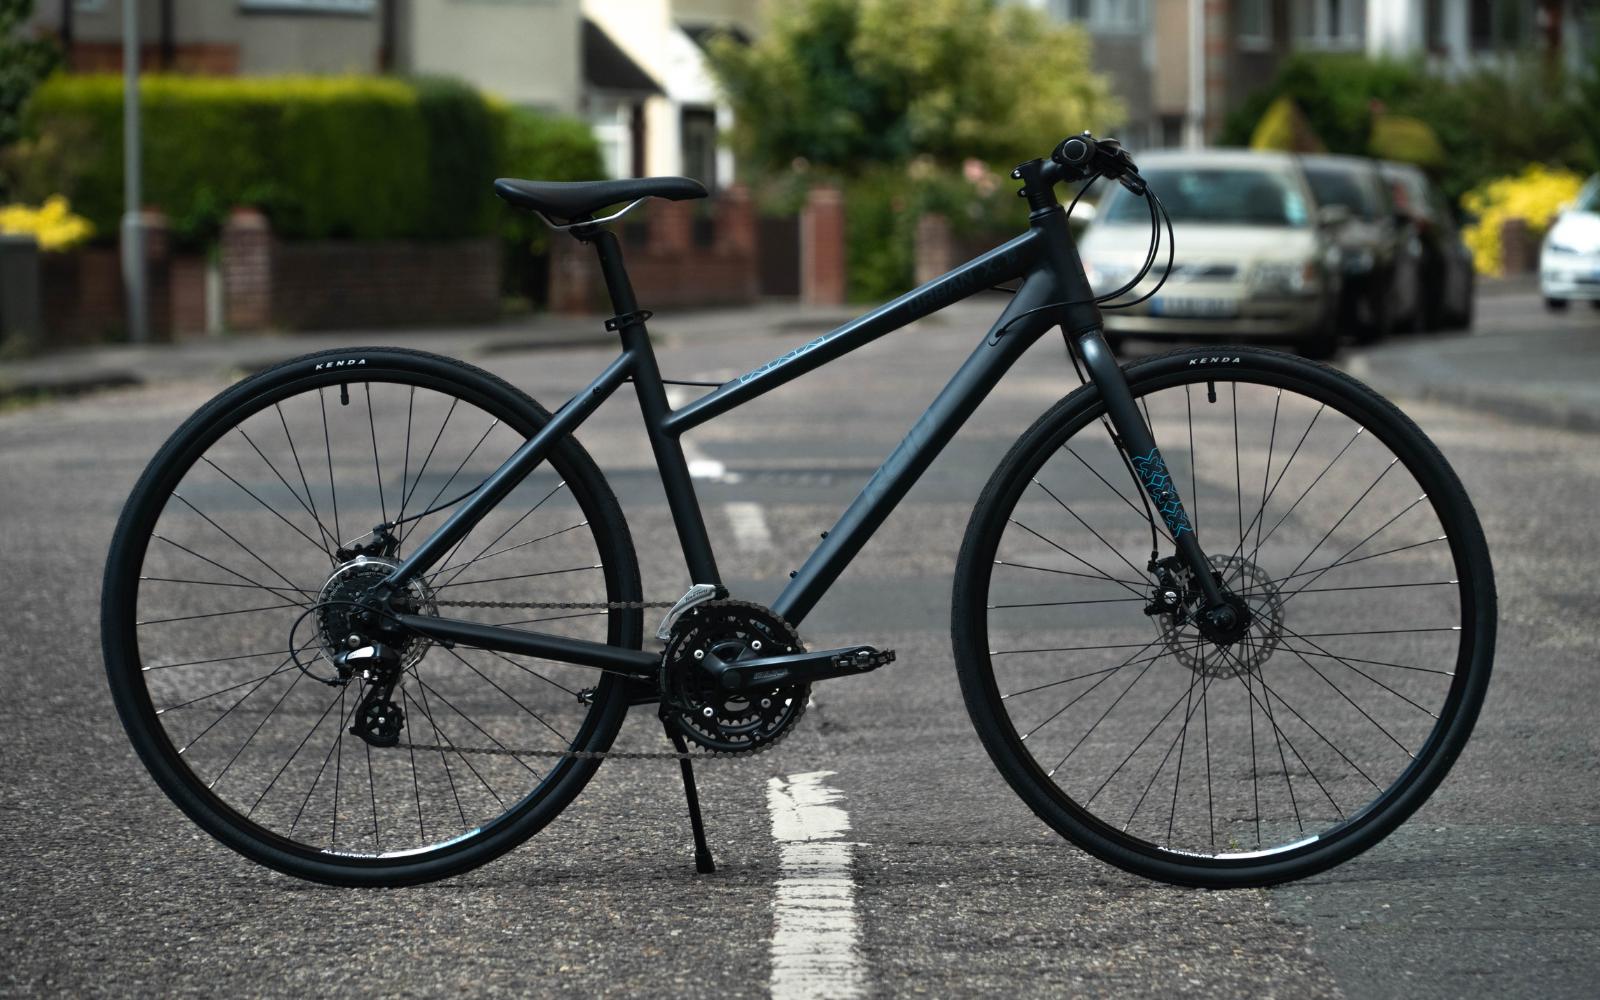 87 - Reid ® - Urban X1 WSD Bike